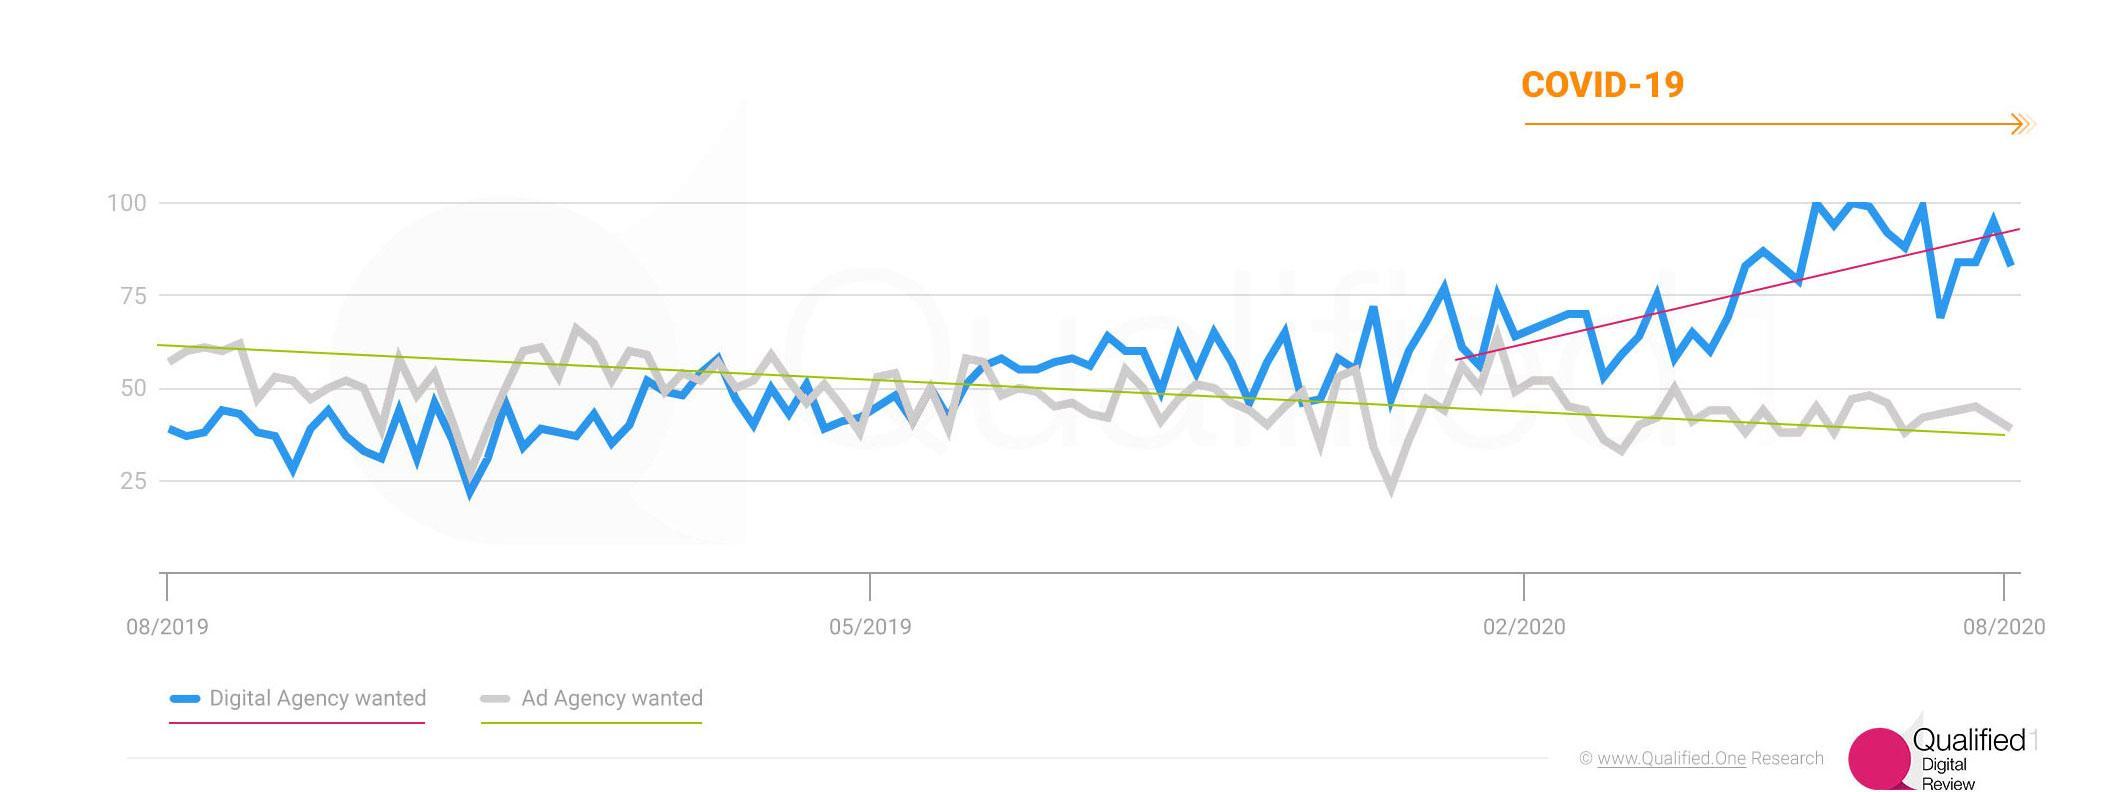 Marketing & Advertising - Digital agencies to dominate Ad market